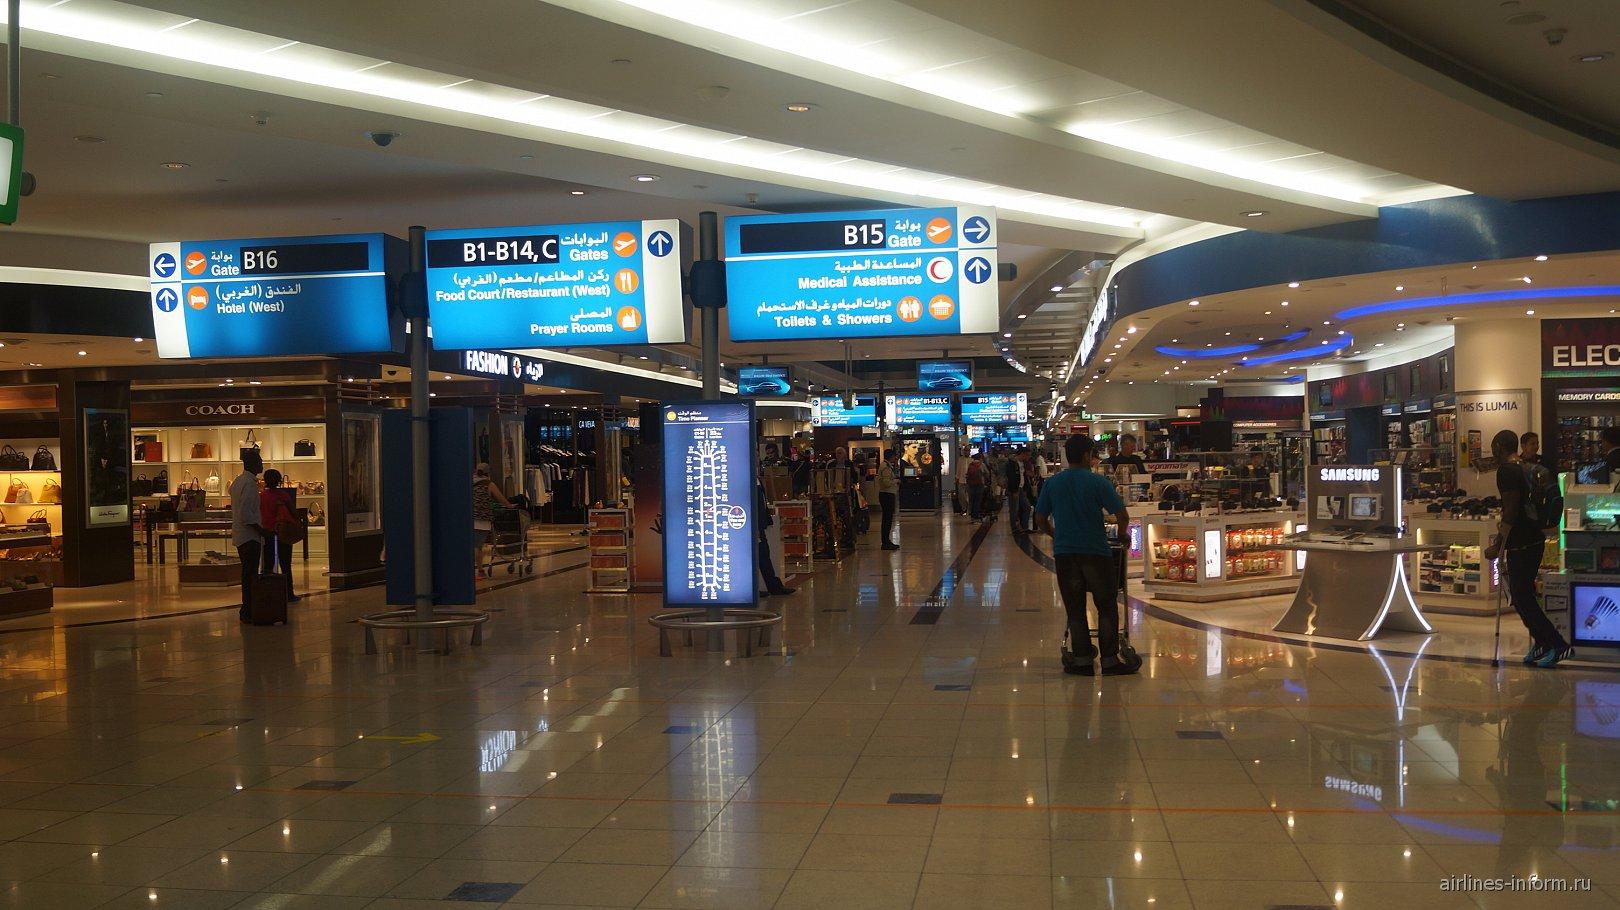 Магазины в аэропорту Дубай